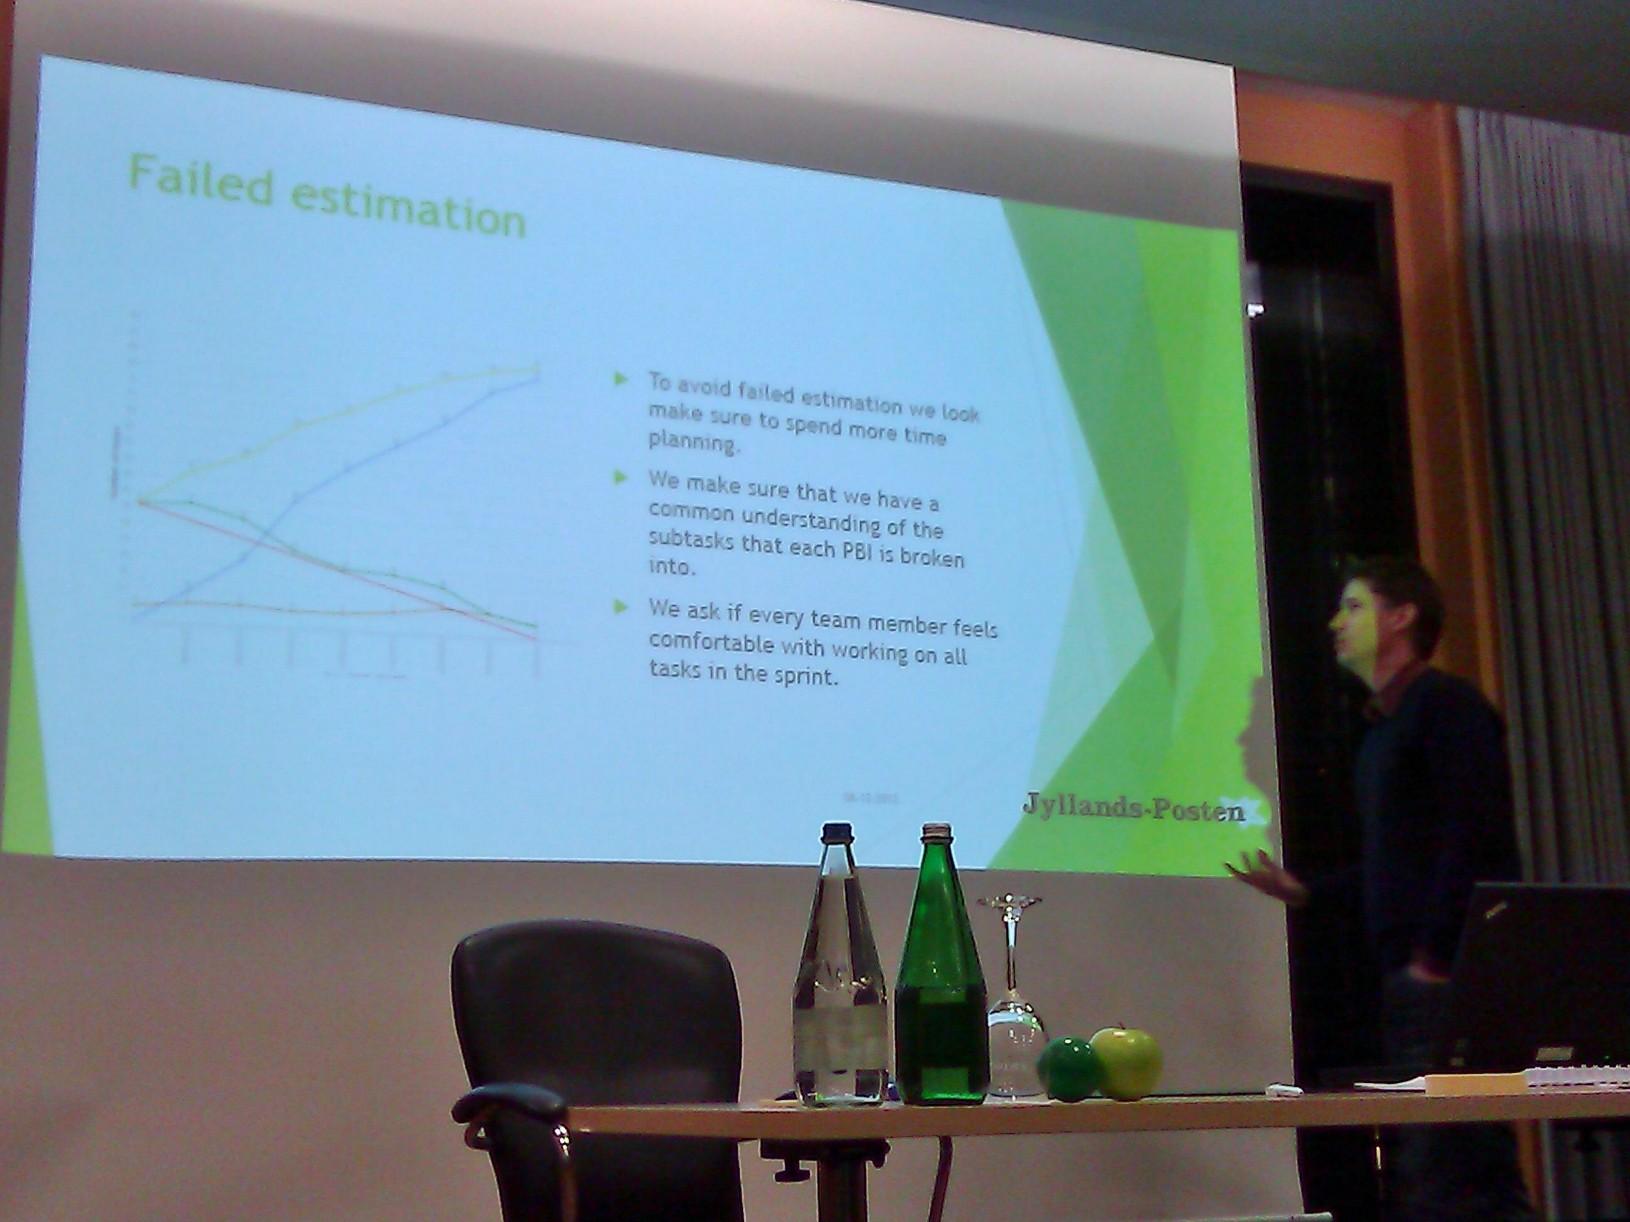 Scrum-agile-estimation-failure